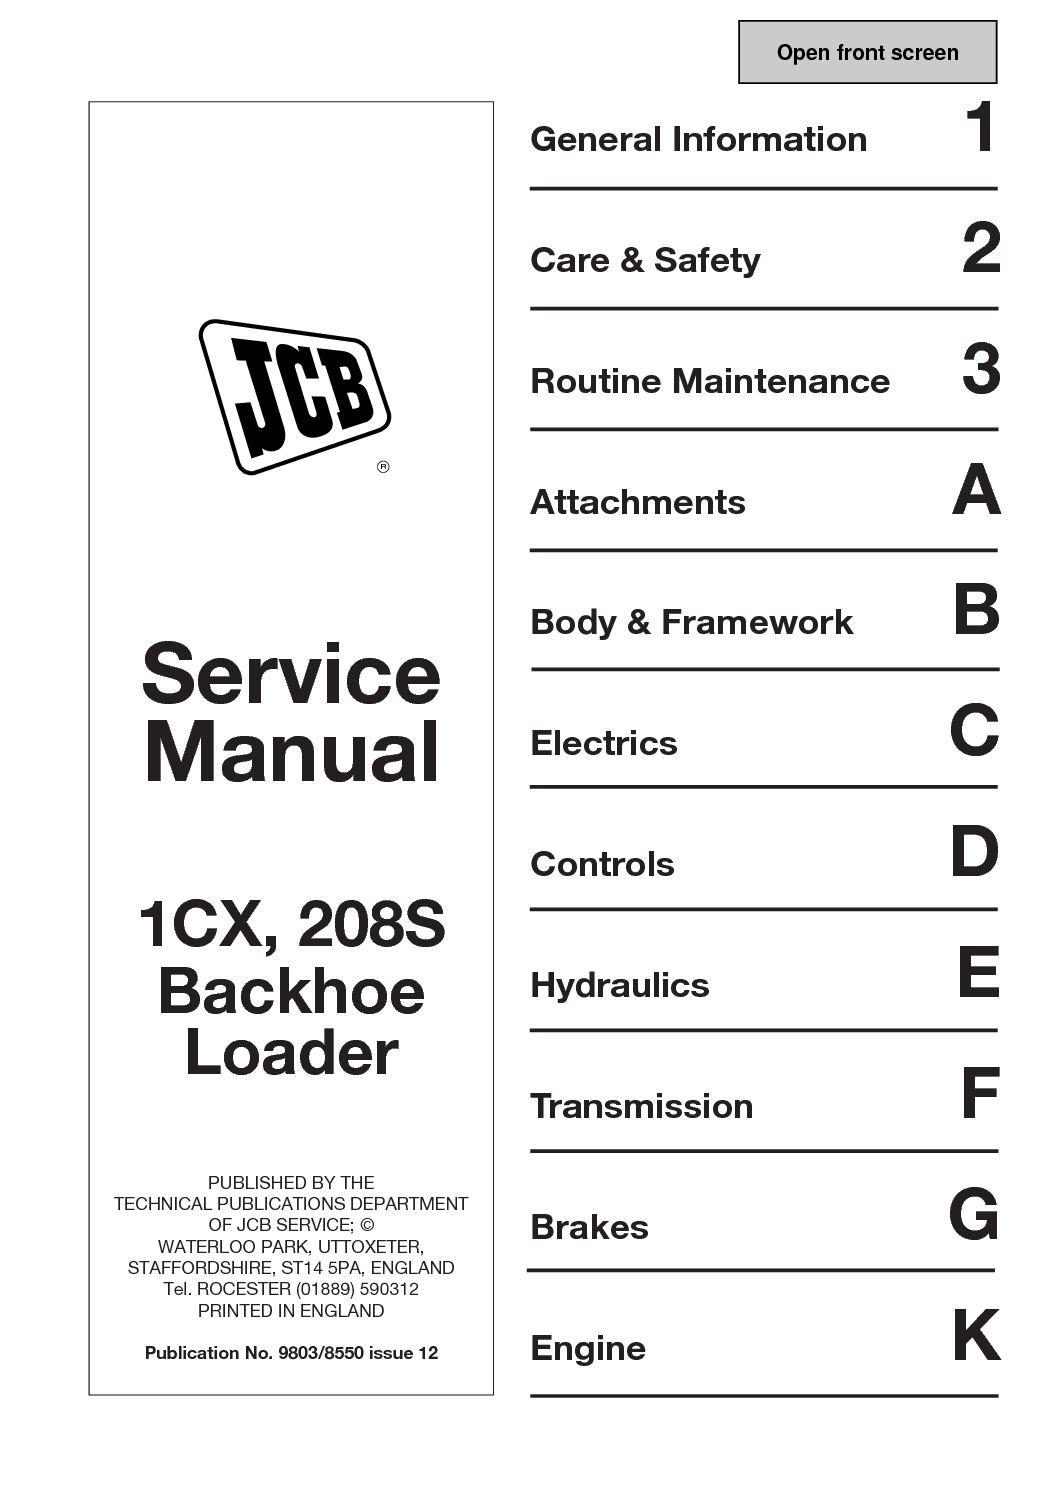 Calaméo - JCB 1CX BACKHOE LOADER Service Repair Manual SN(751600 To 752999).